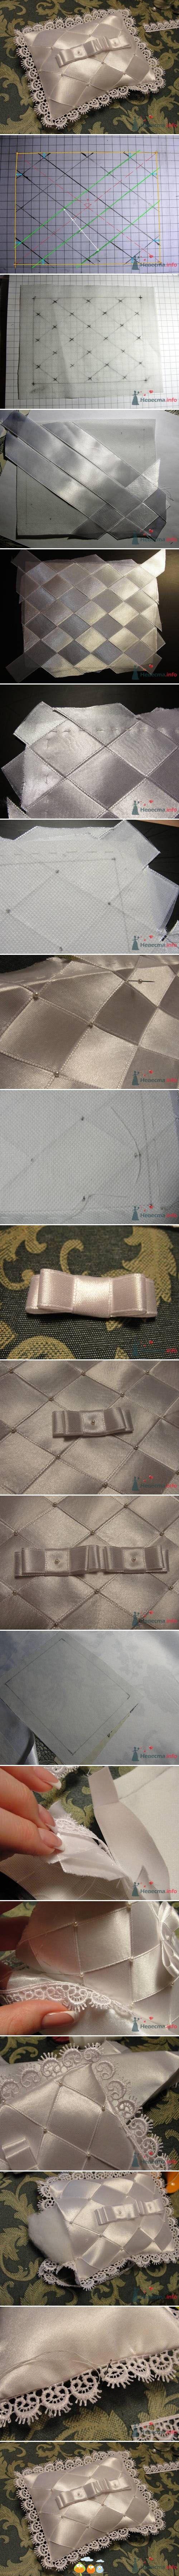 Pretty idea for a ring pillow